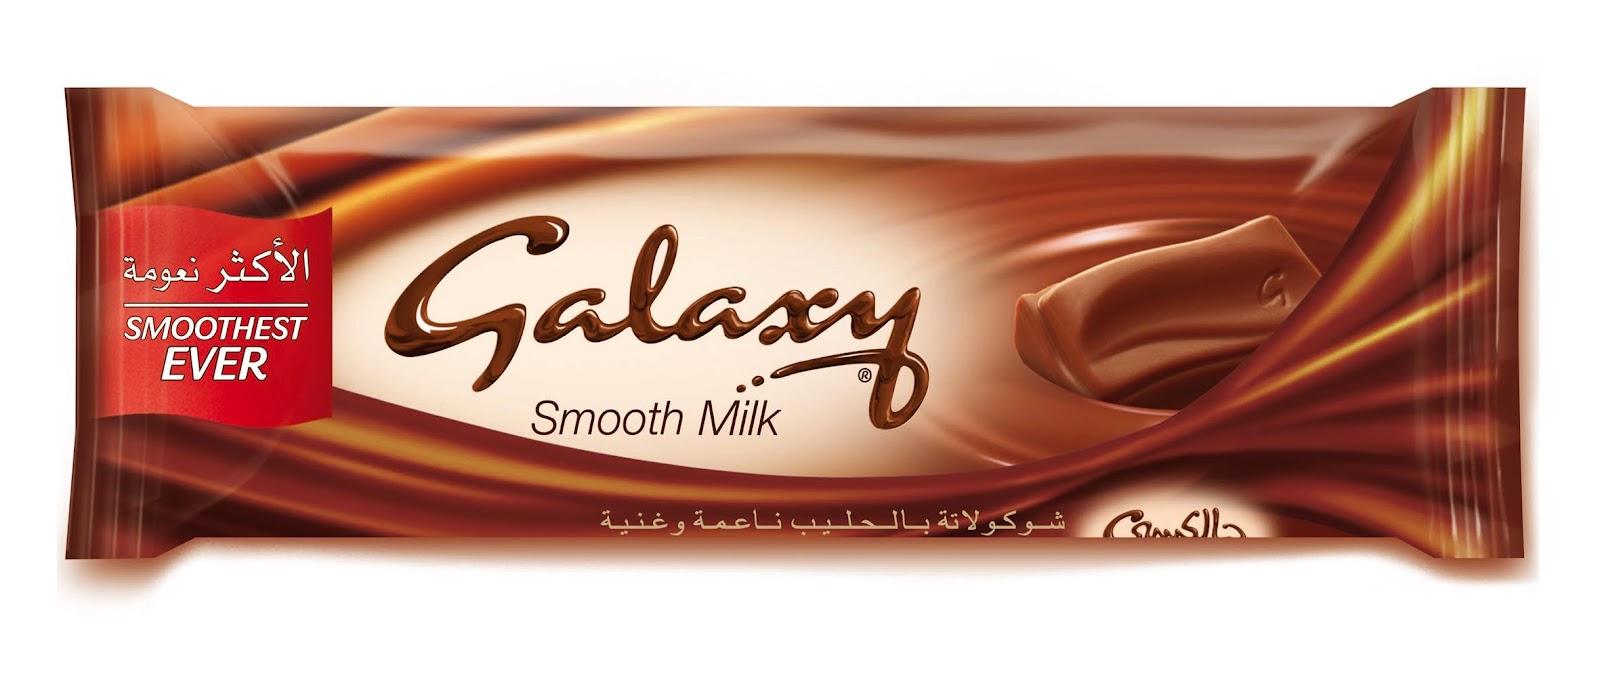 Mmad Galaxy Chocolates Packagings